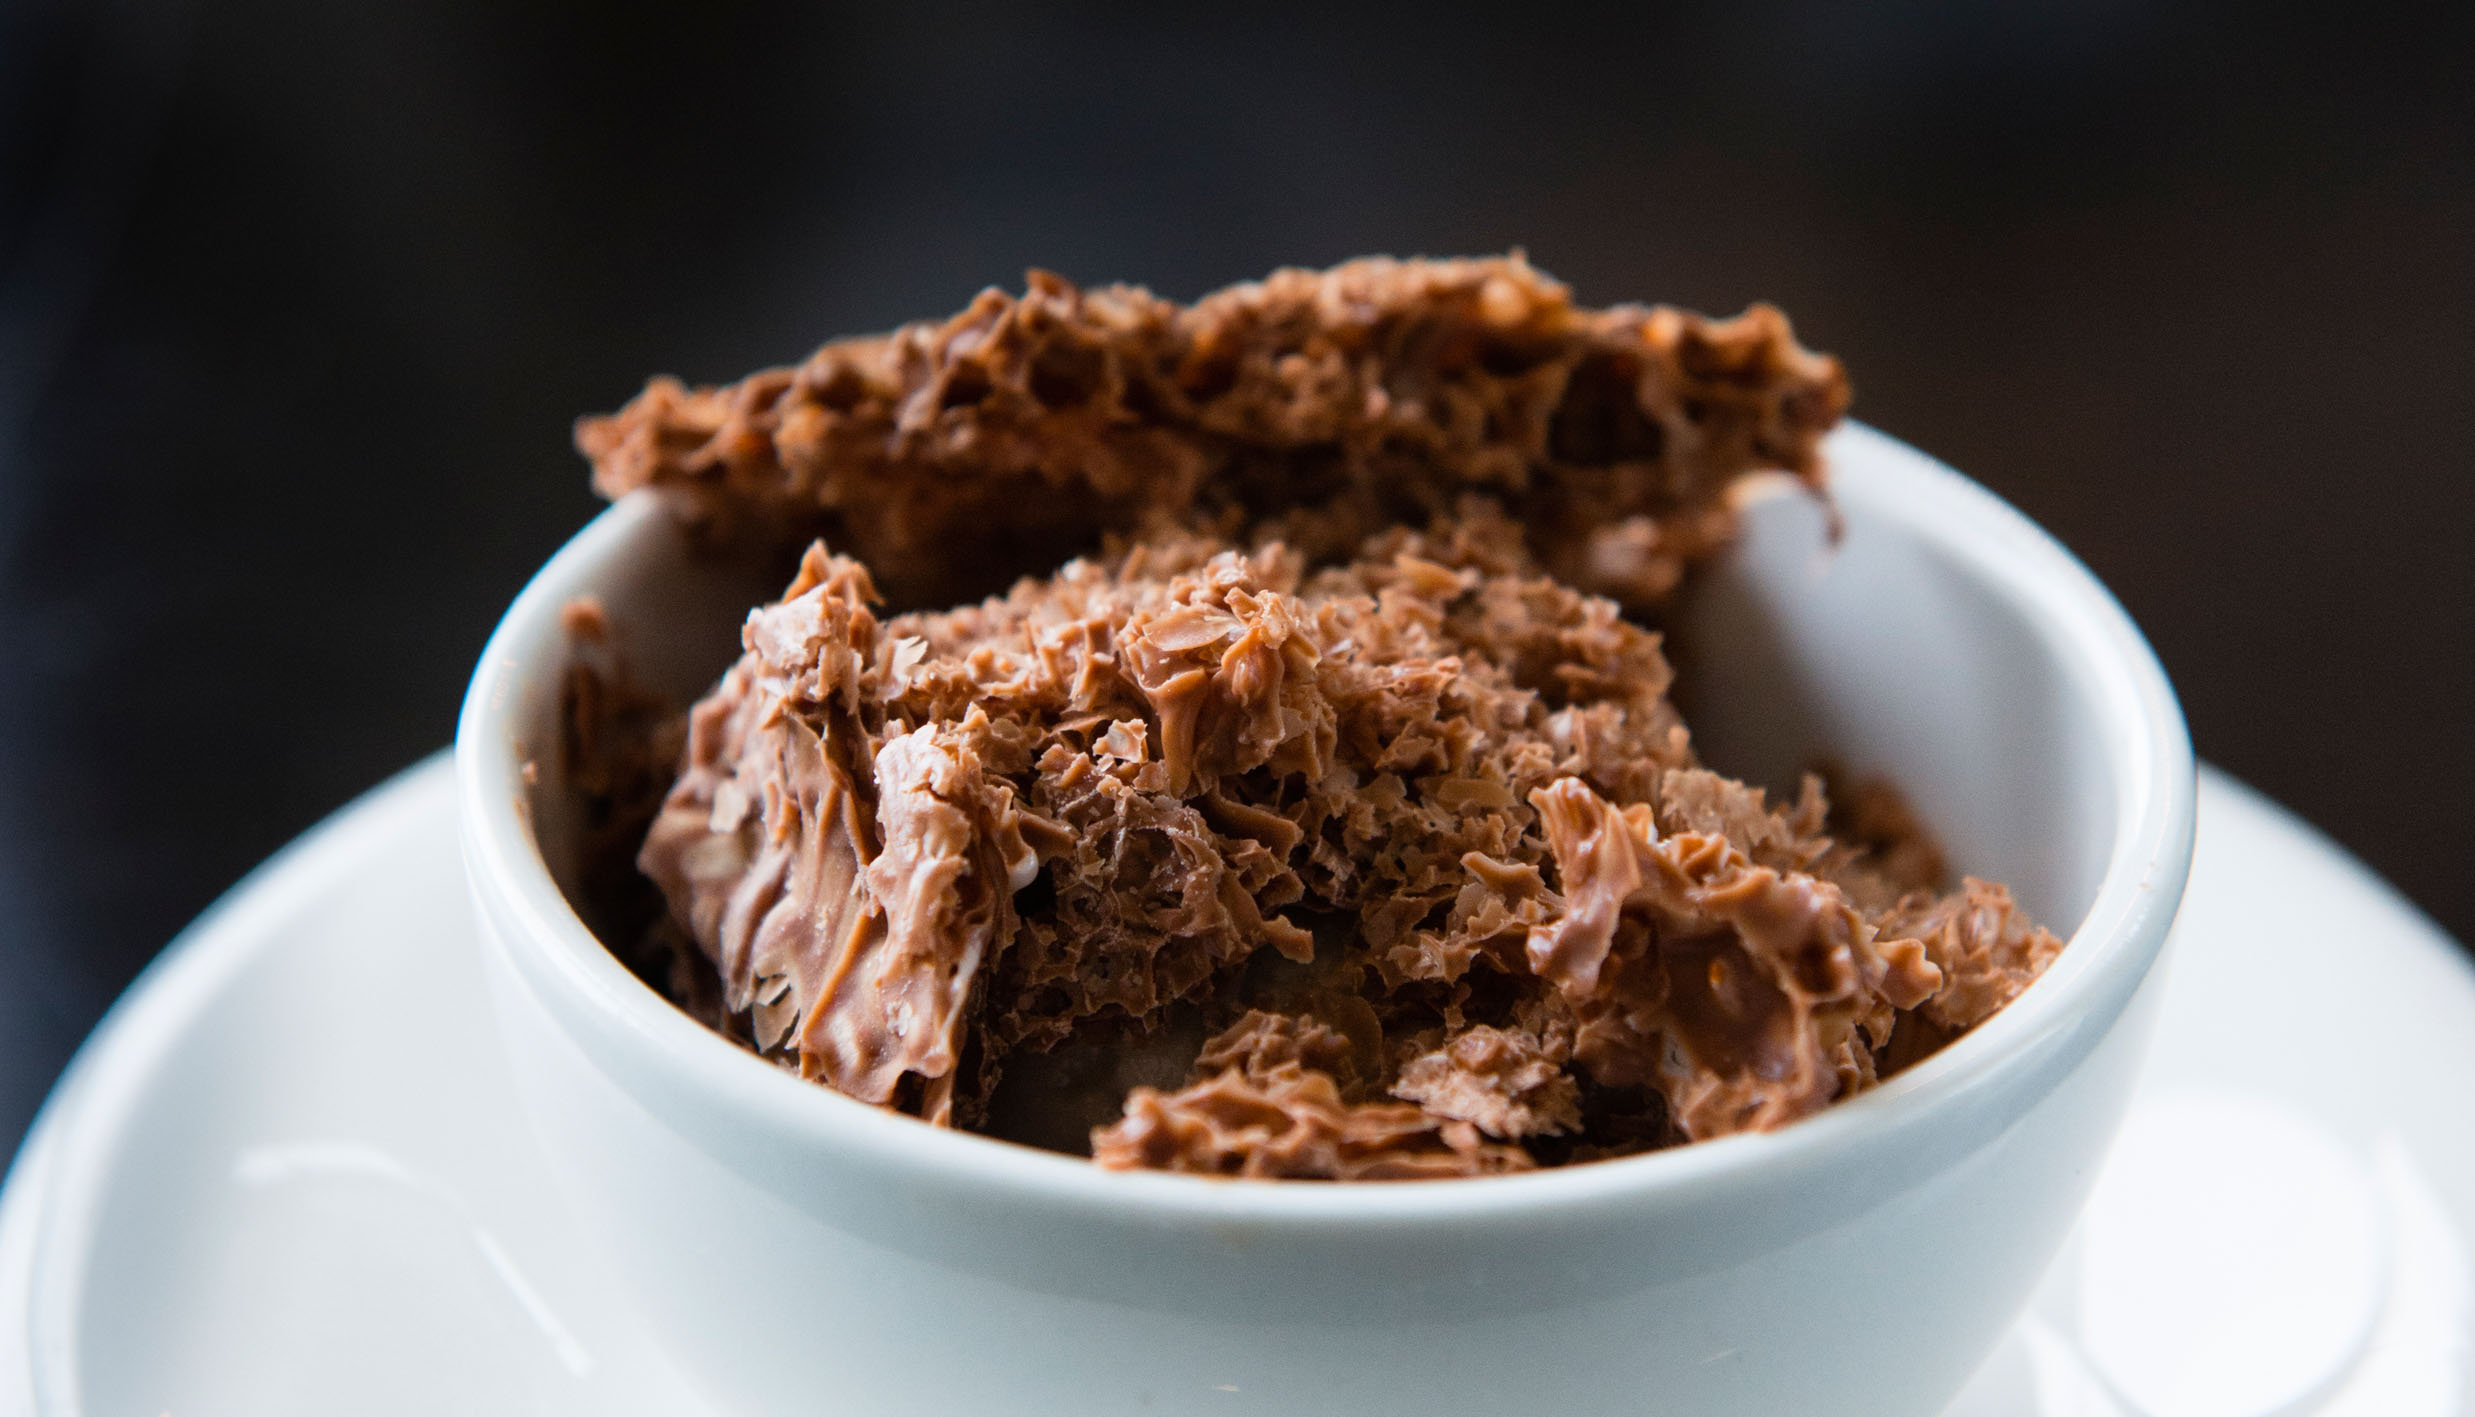 luftig chokolade